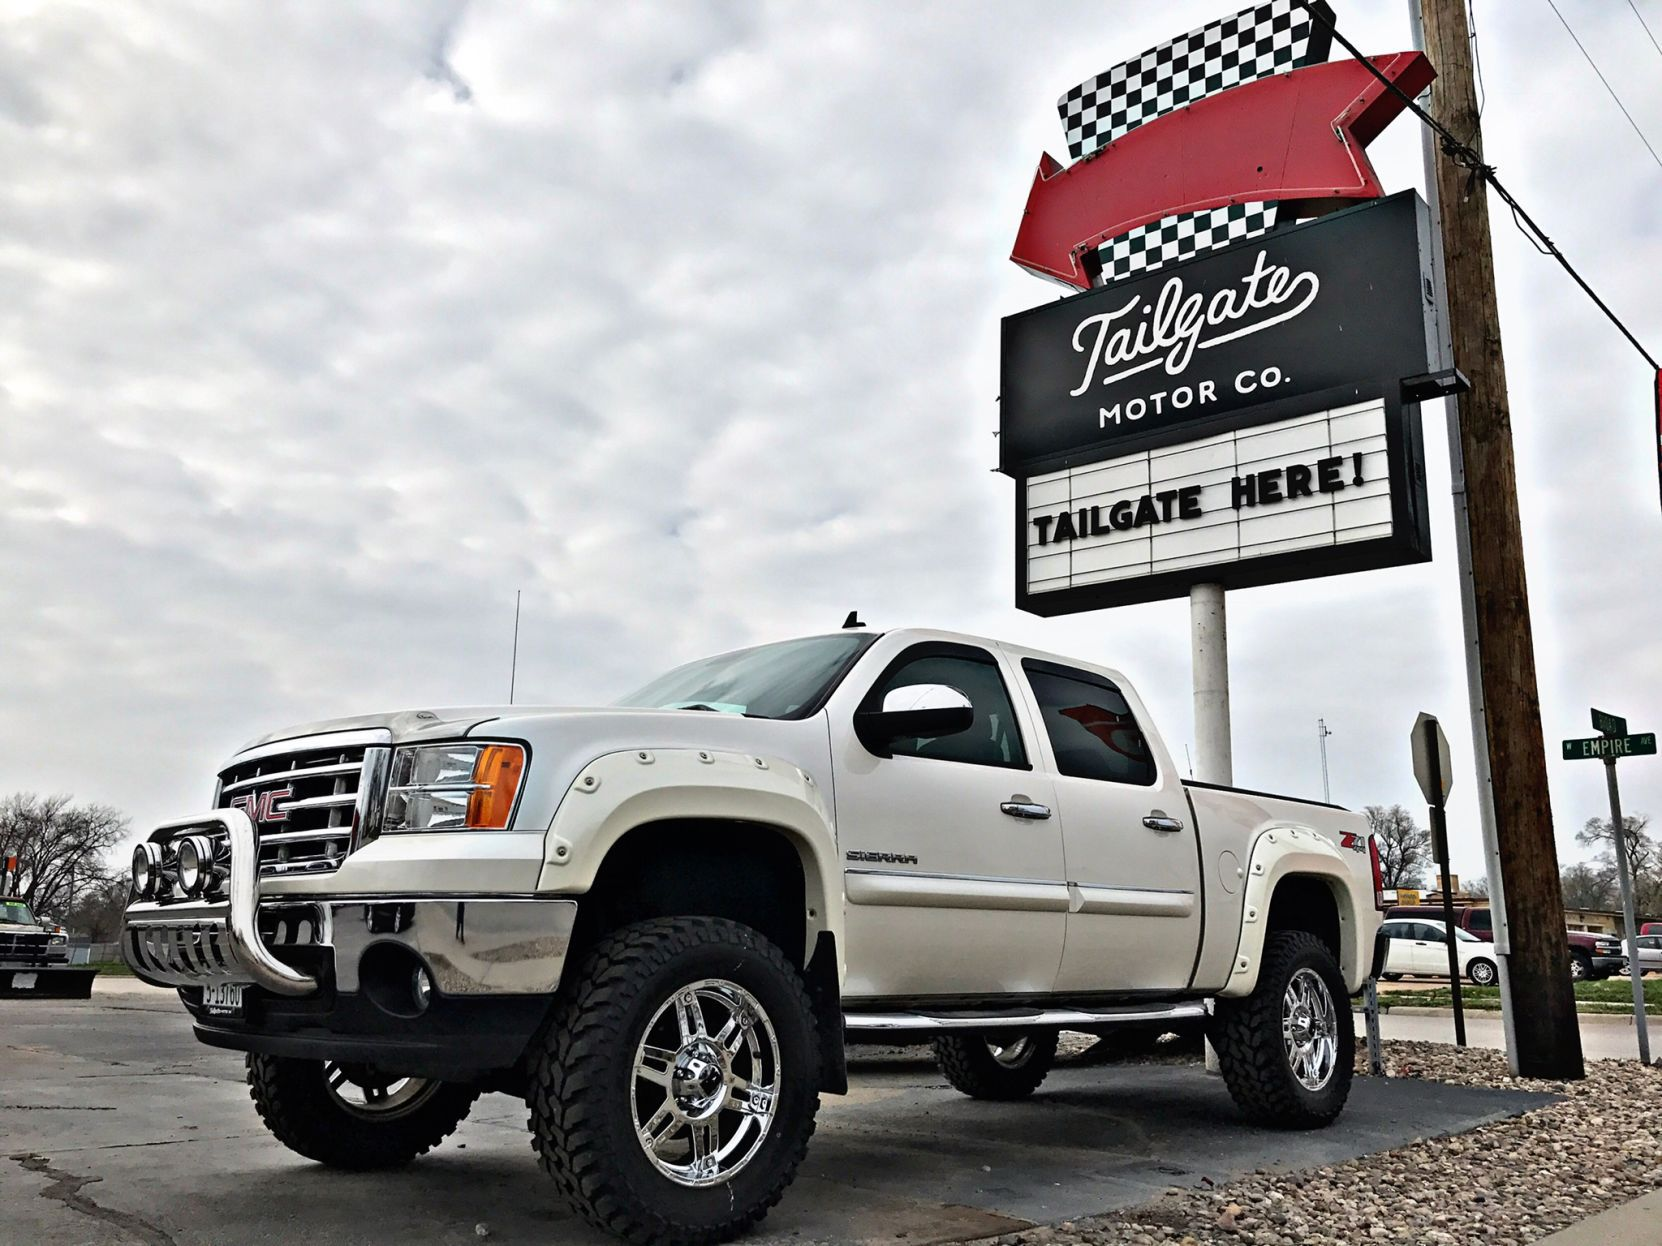 new vehicle dealership making a splash local fremonttribune com rh fremonttribune com